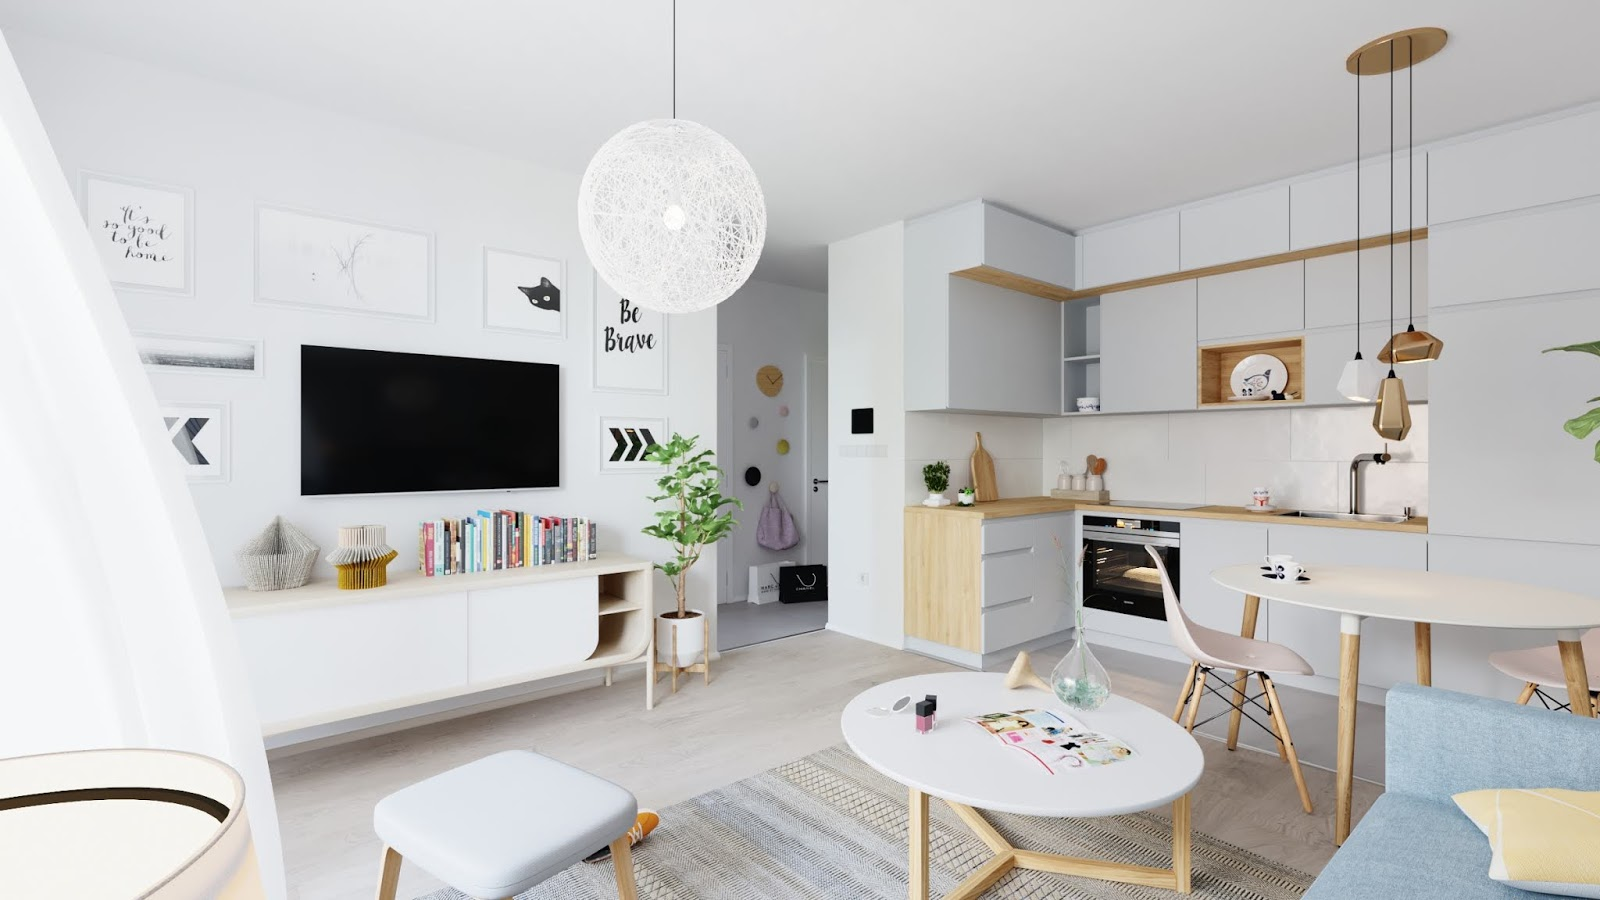 nappali lakberendezédése